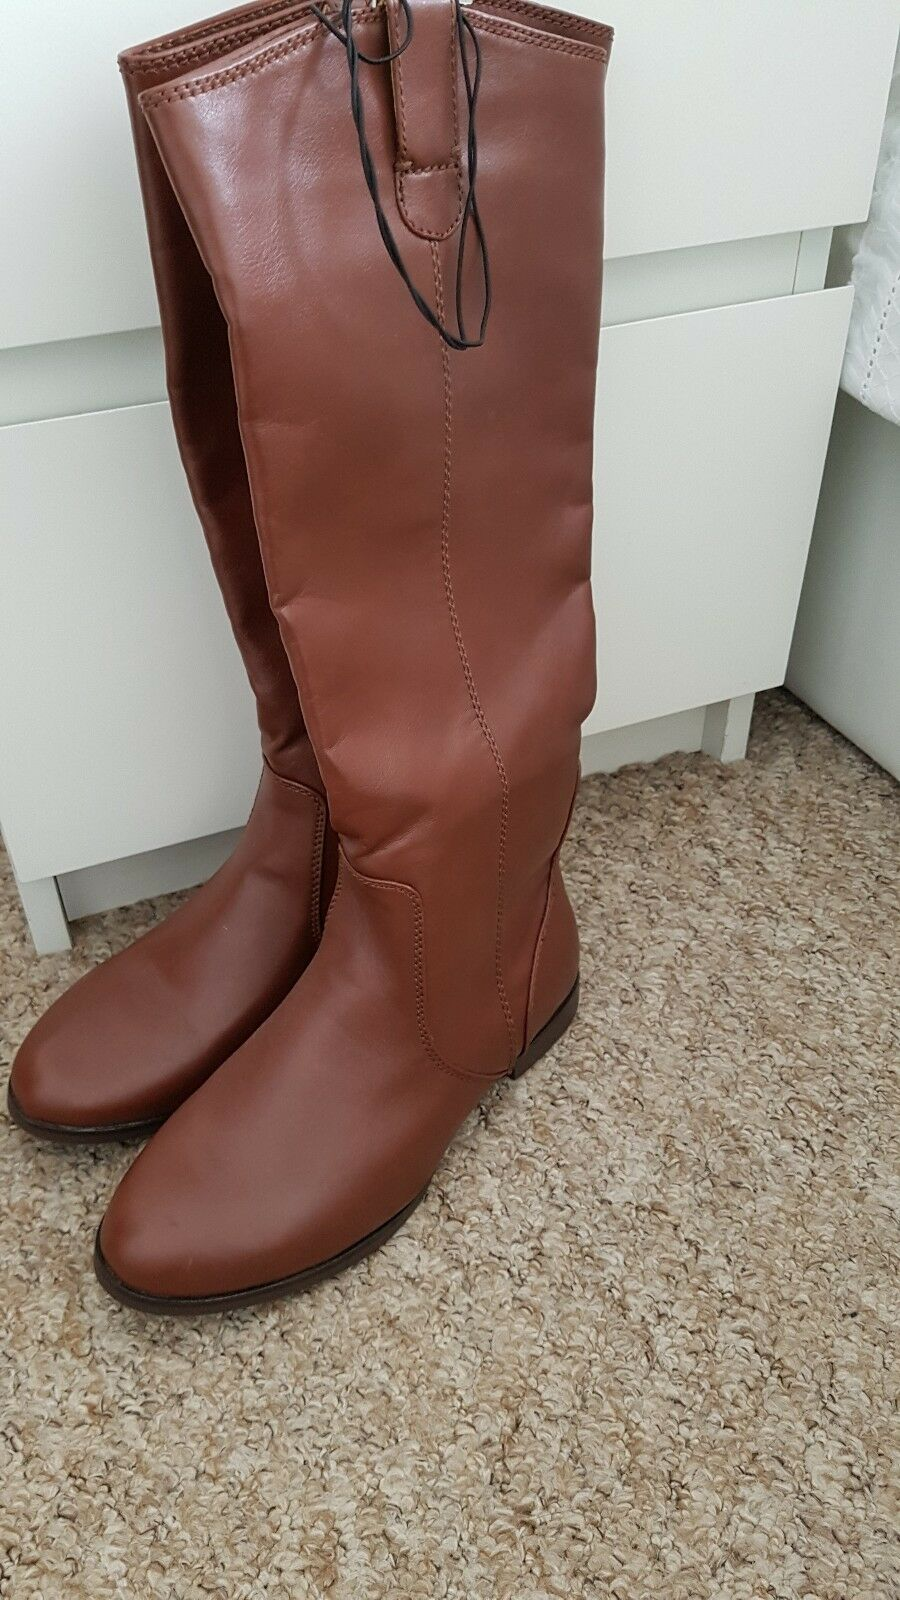 Womens tan knee high riding boots